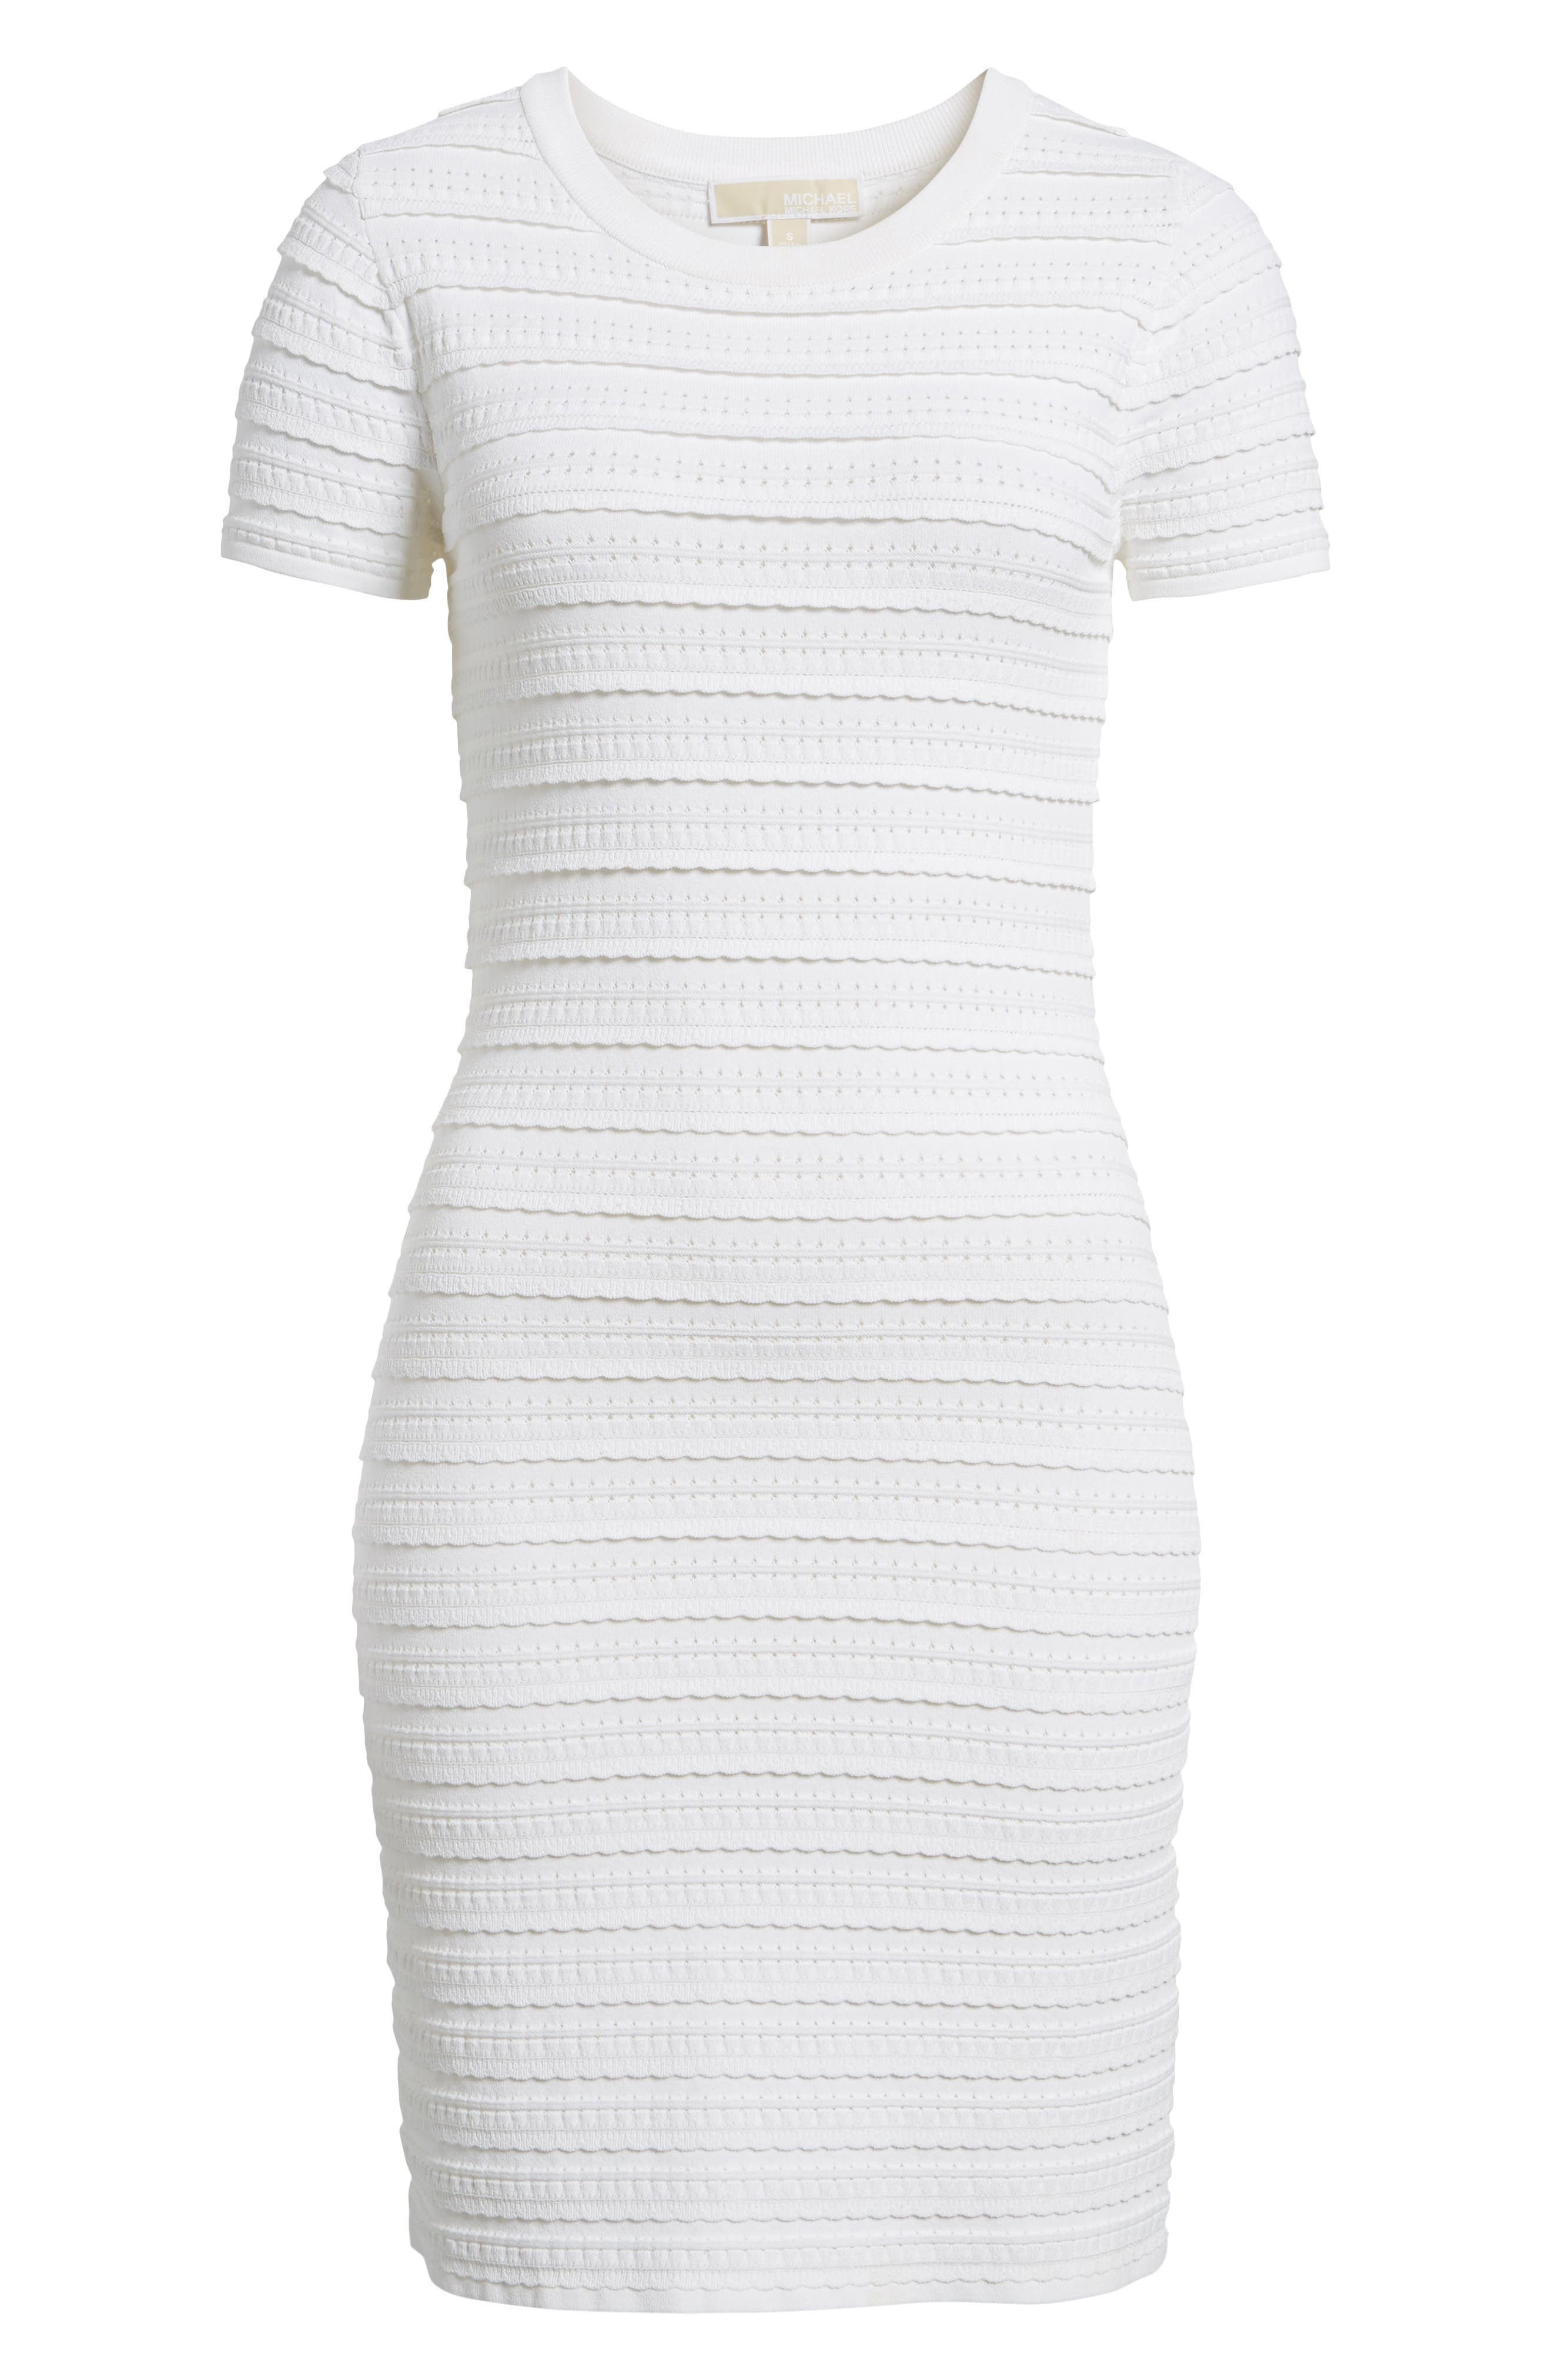 Tiered Sheath Dress,                             Alternate thumbnail 6, color,                             100